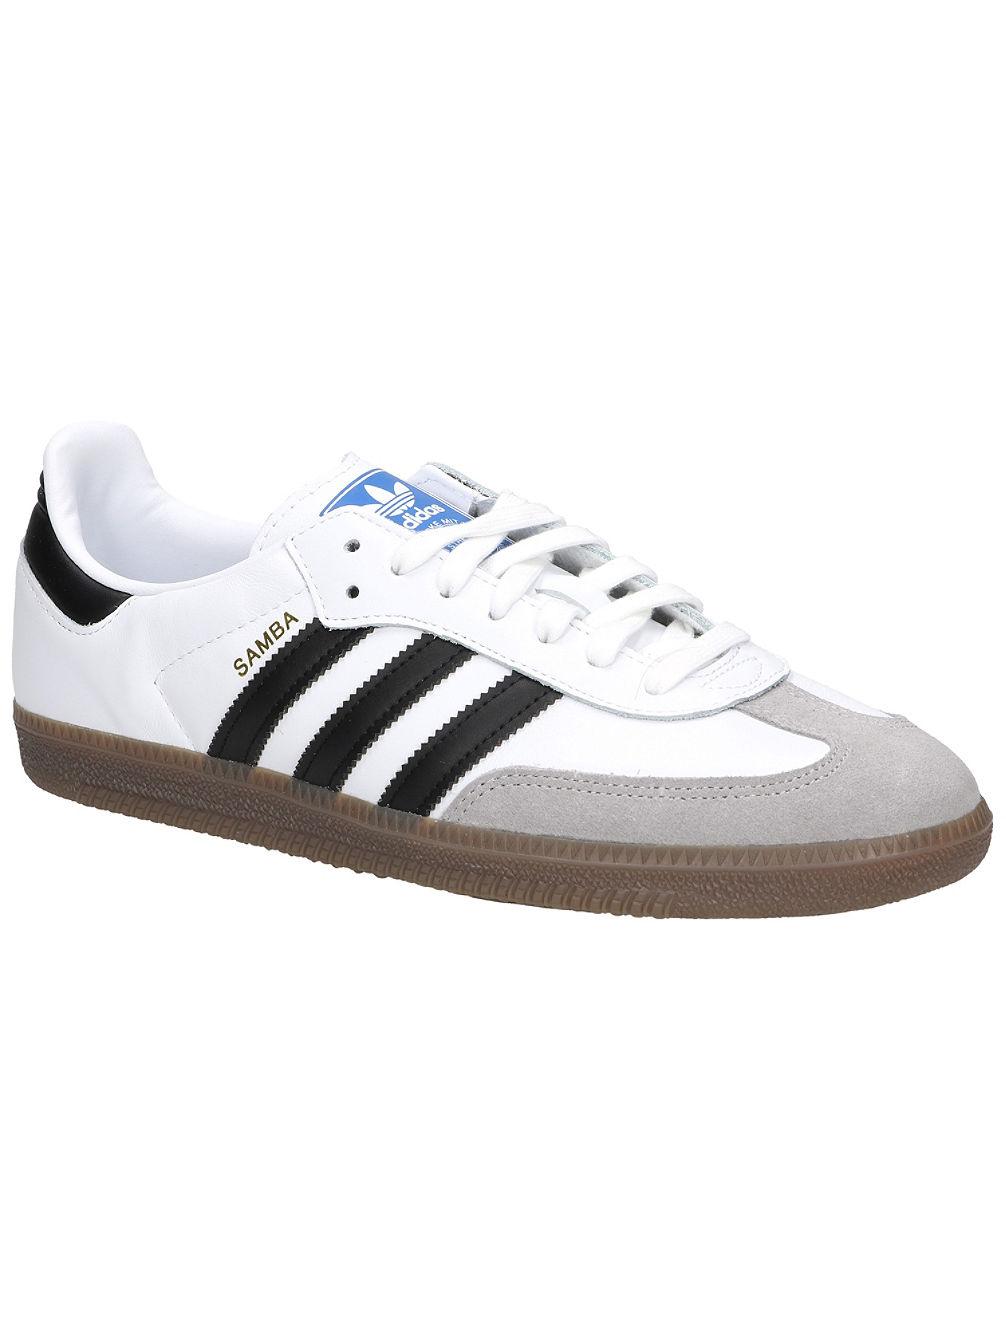 super popular 56efa 99419 adidas Originals Samba OG Sneakers